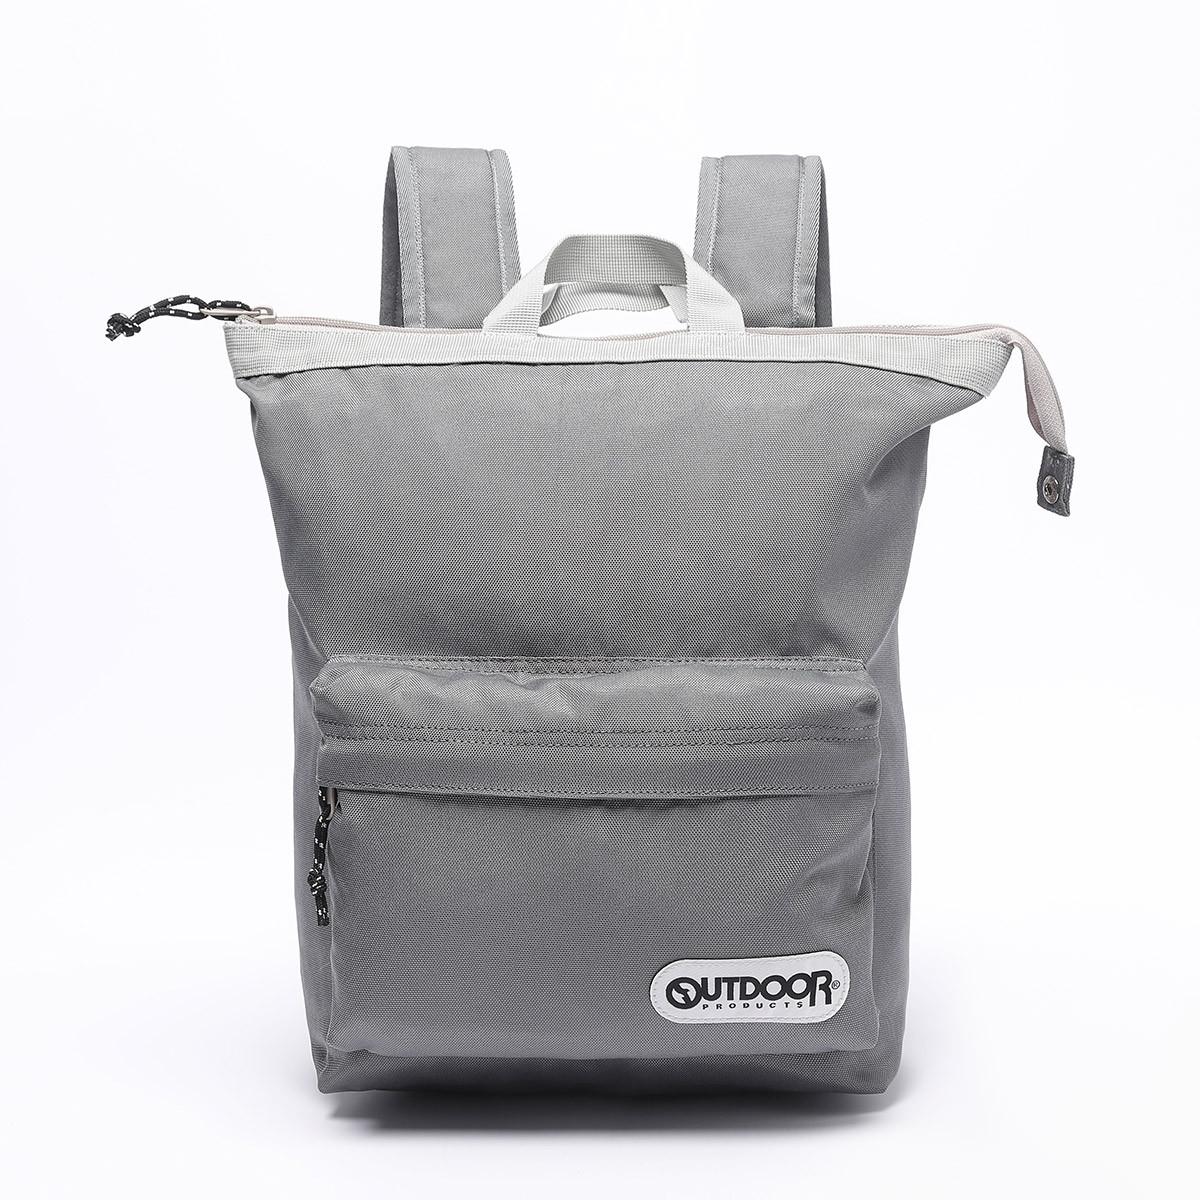 OUTDOOR PRODUCTS OUTDOOR 2019新款 耐磨实用 双肩背包